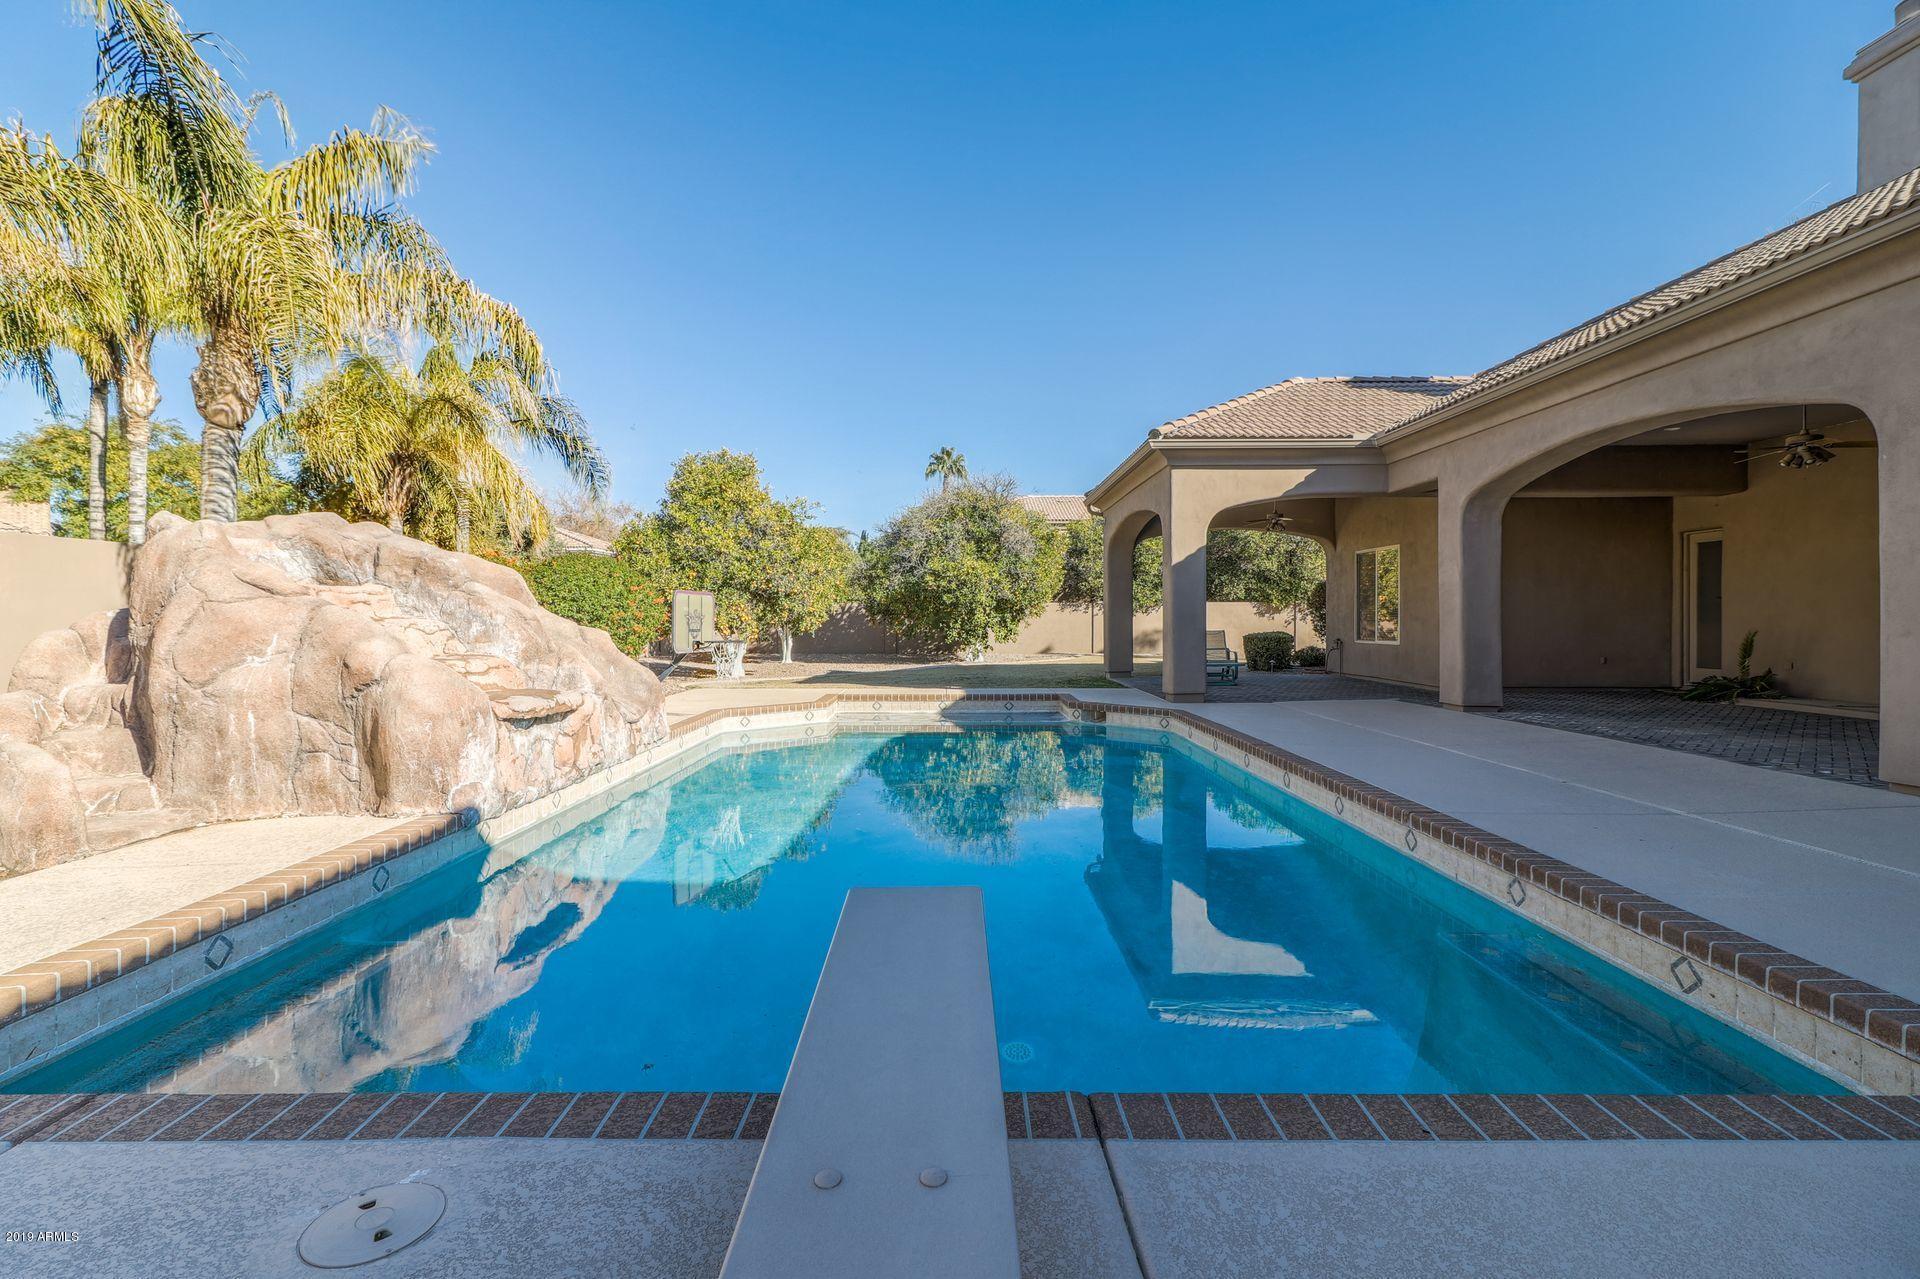 MLS 5883940 3928 E MINTON Circle, Mesa, AZ